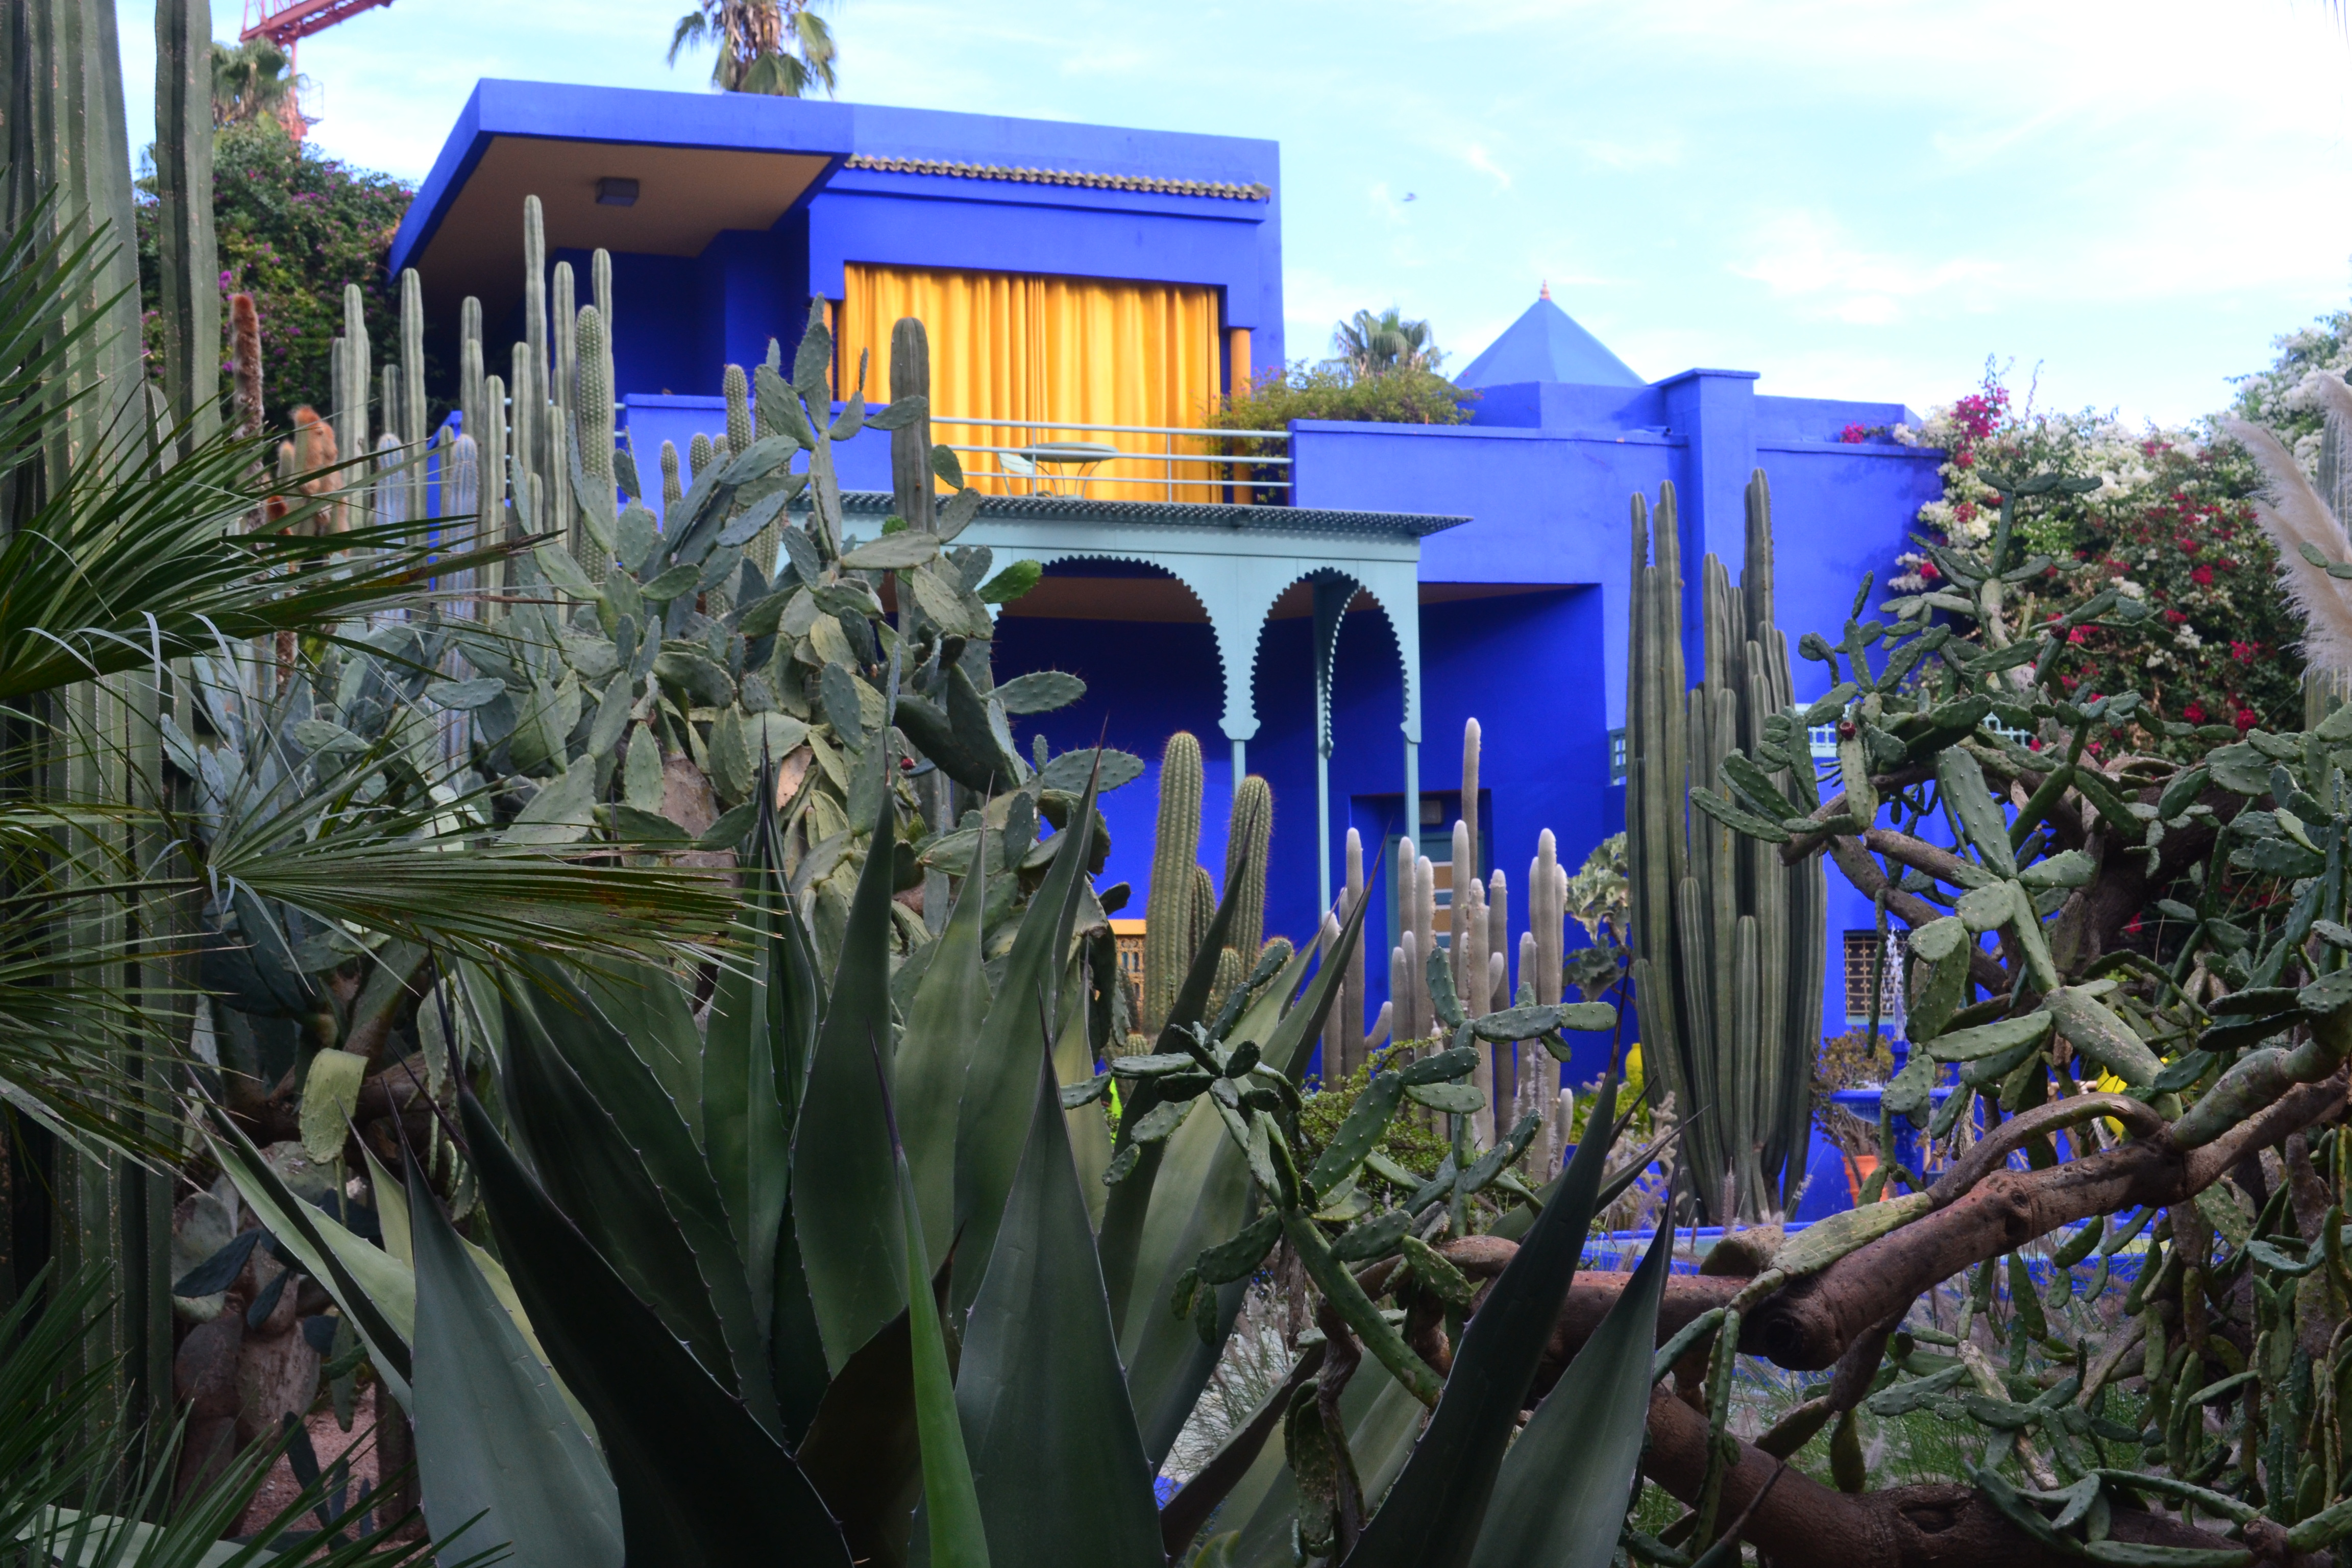 2eme jour au maroc visite du jardin majorelle du ksar for Jardin majorelle 2015